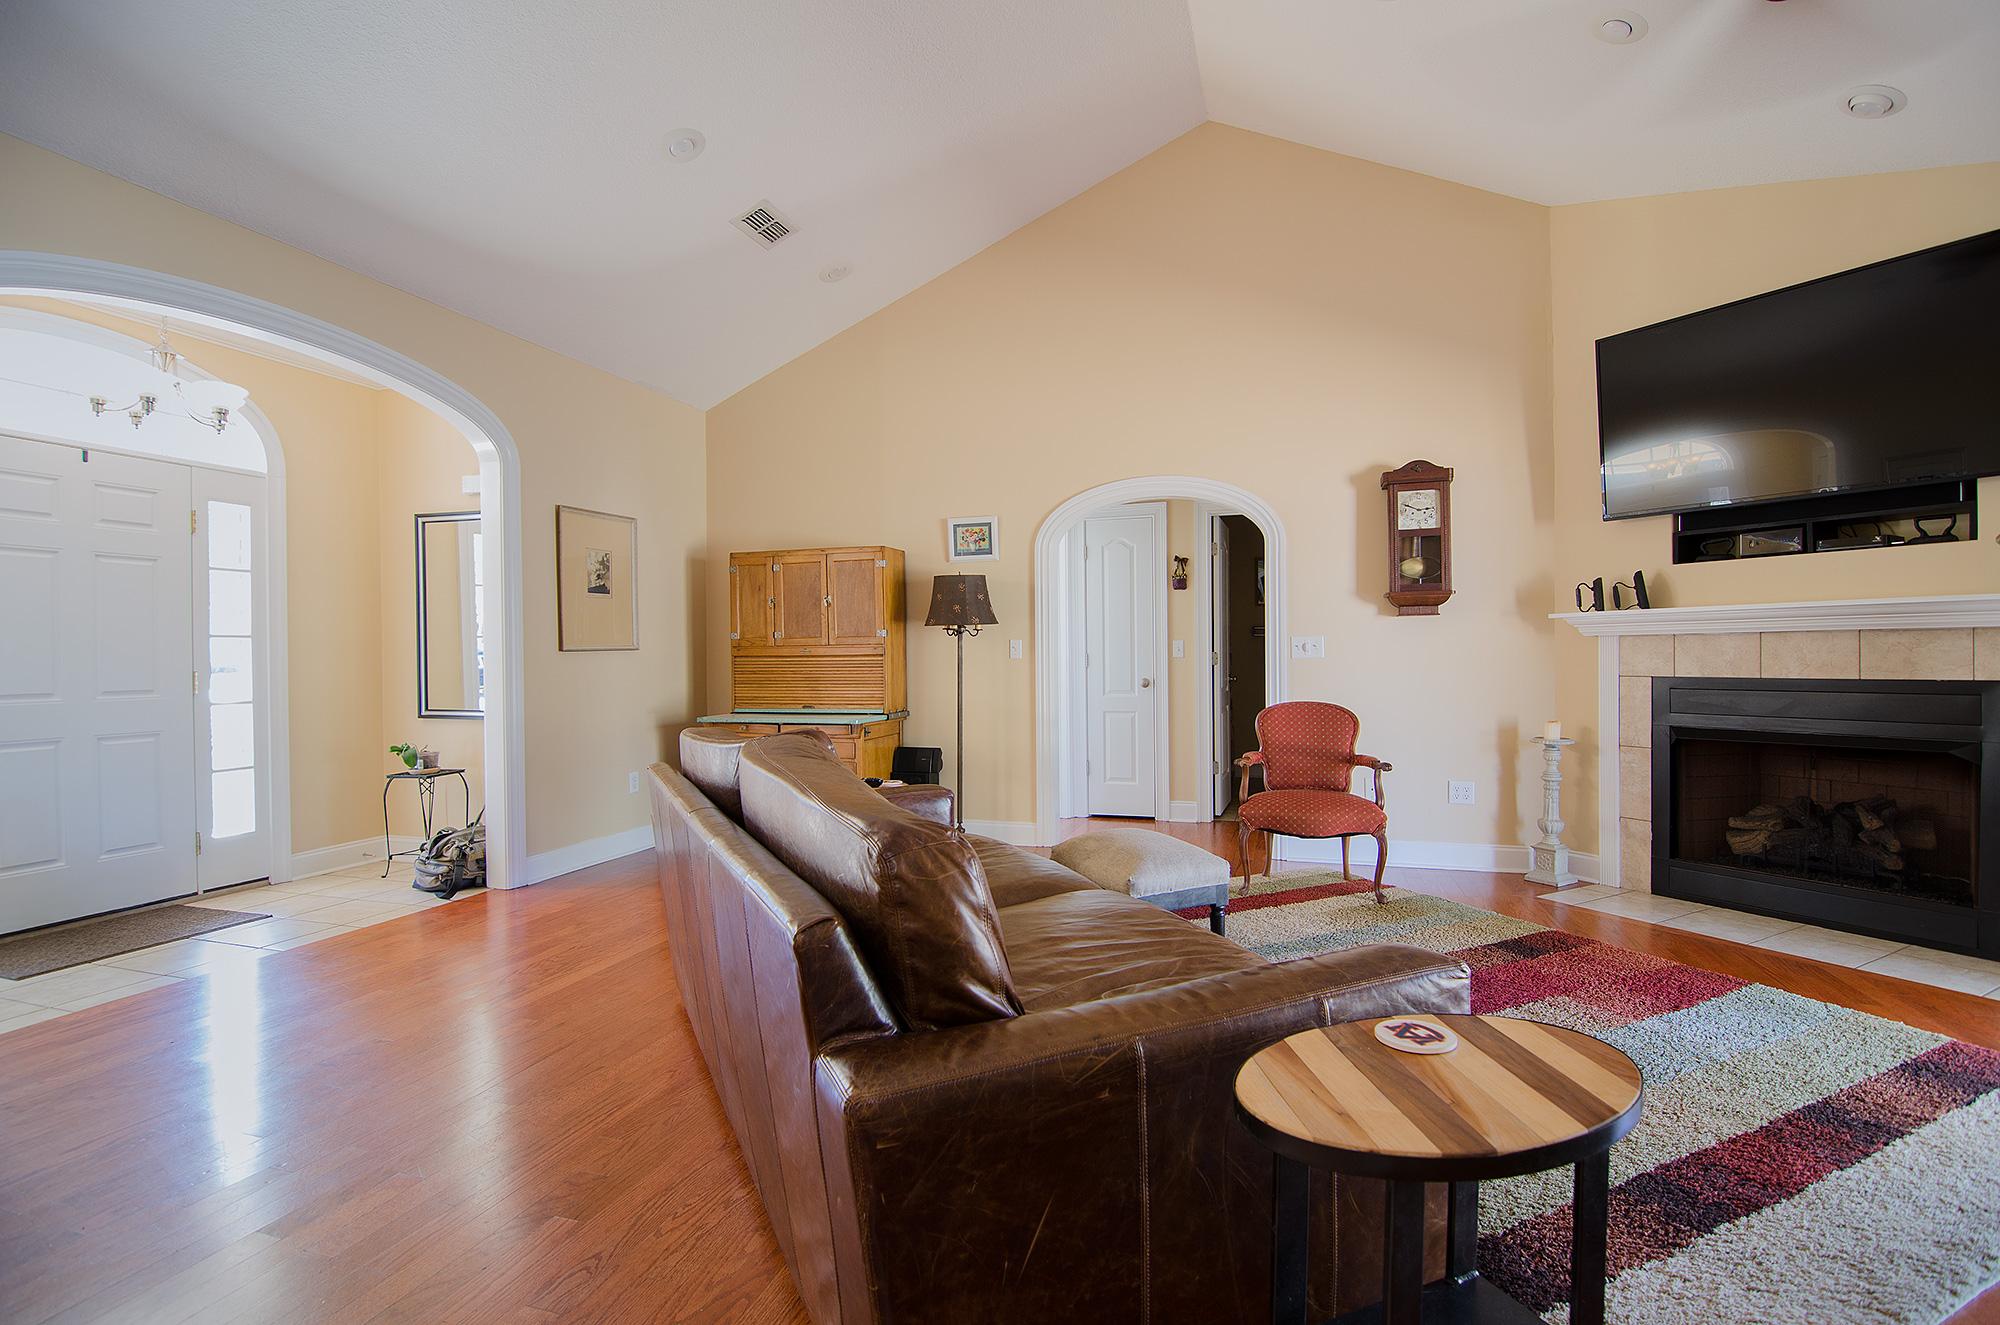 3riversrealty,-bainbridge-home-for-sale,boxwood-drive,mills-brock,randee-eubanks,living-room2.jpg